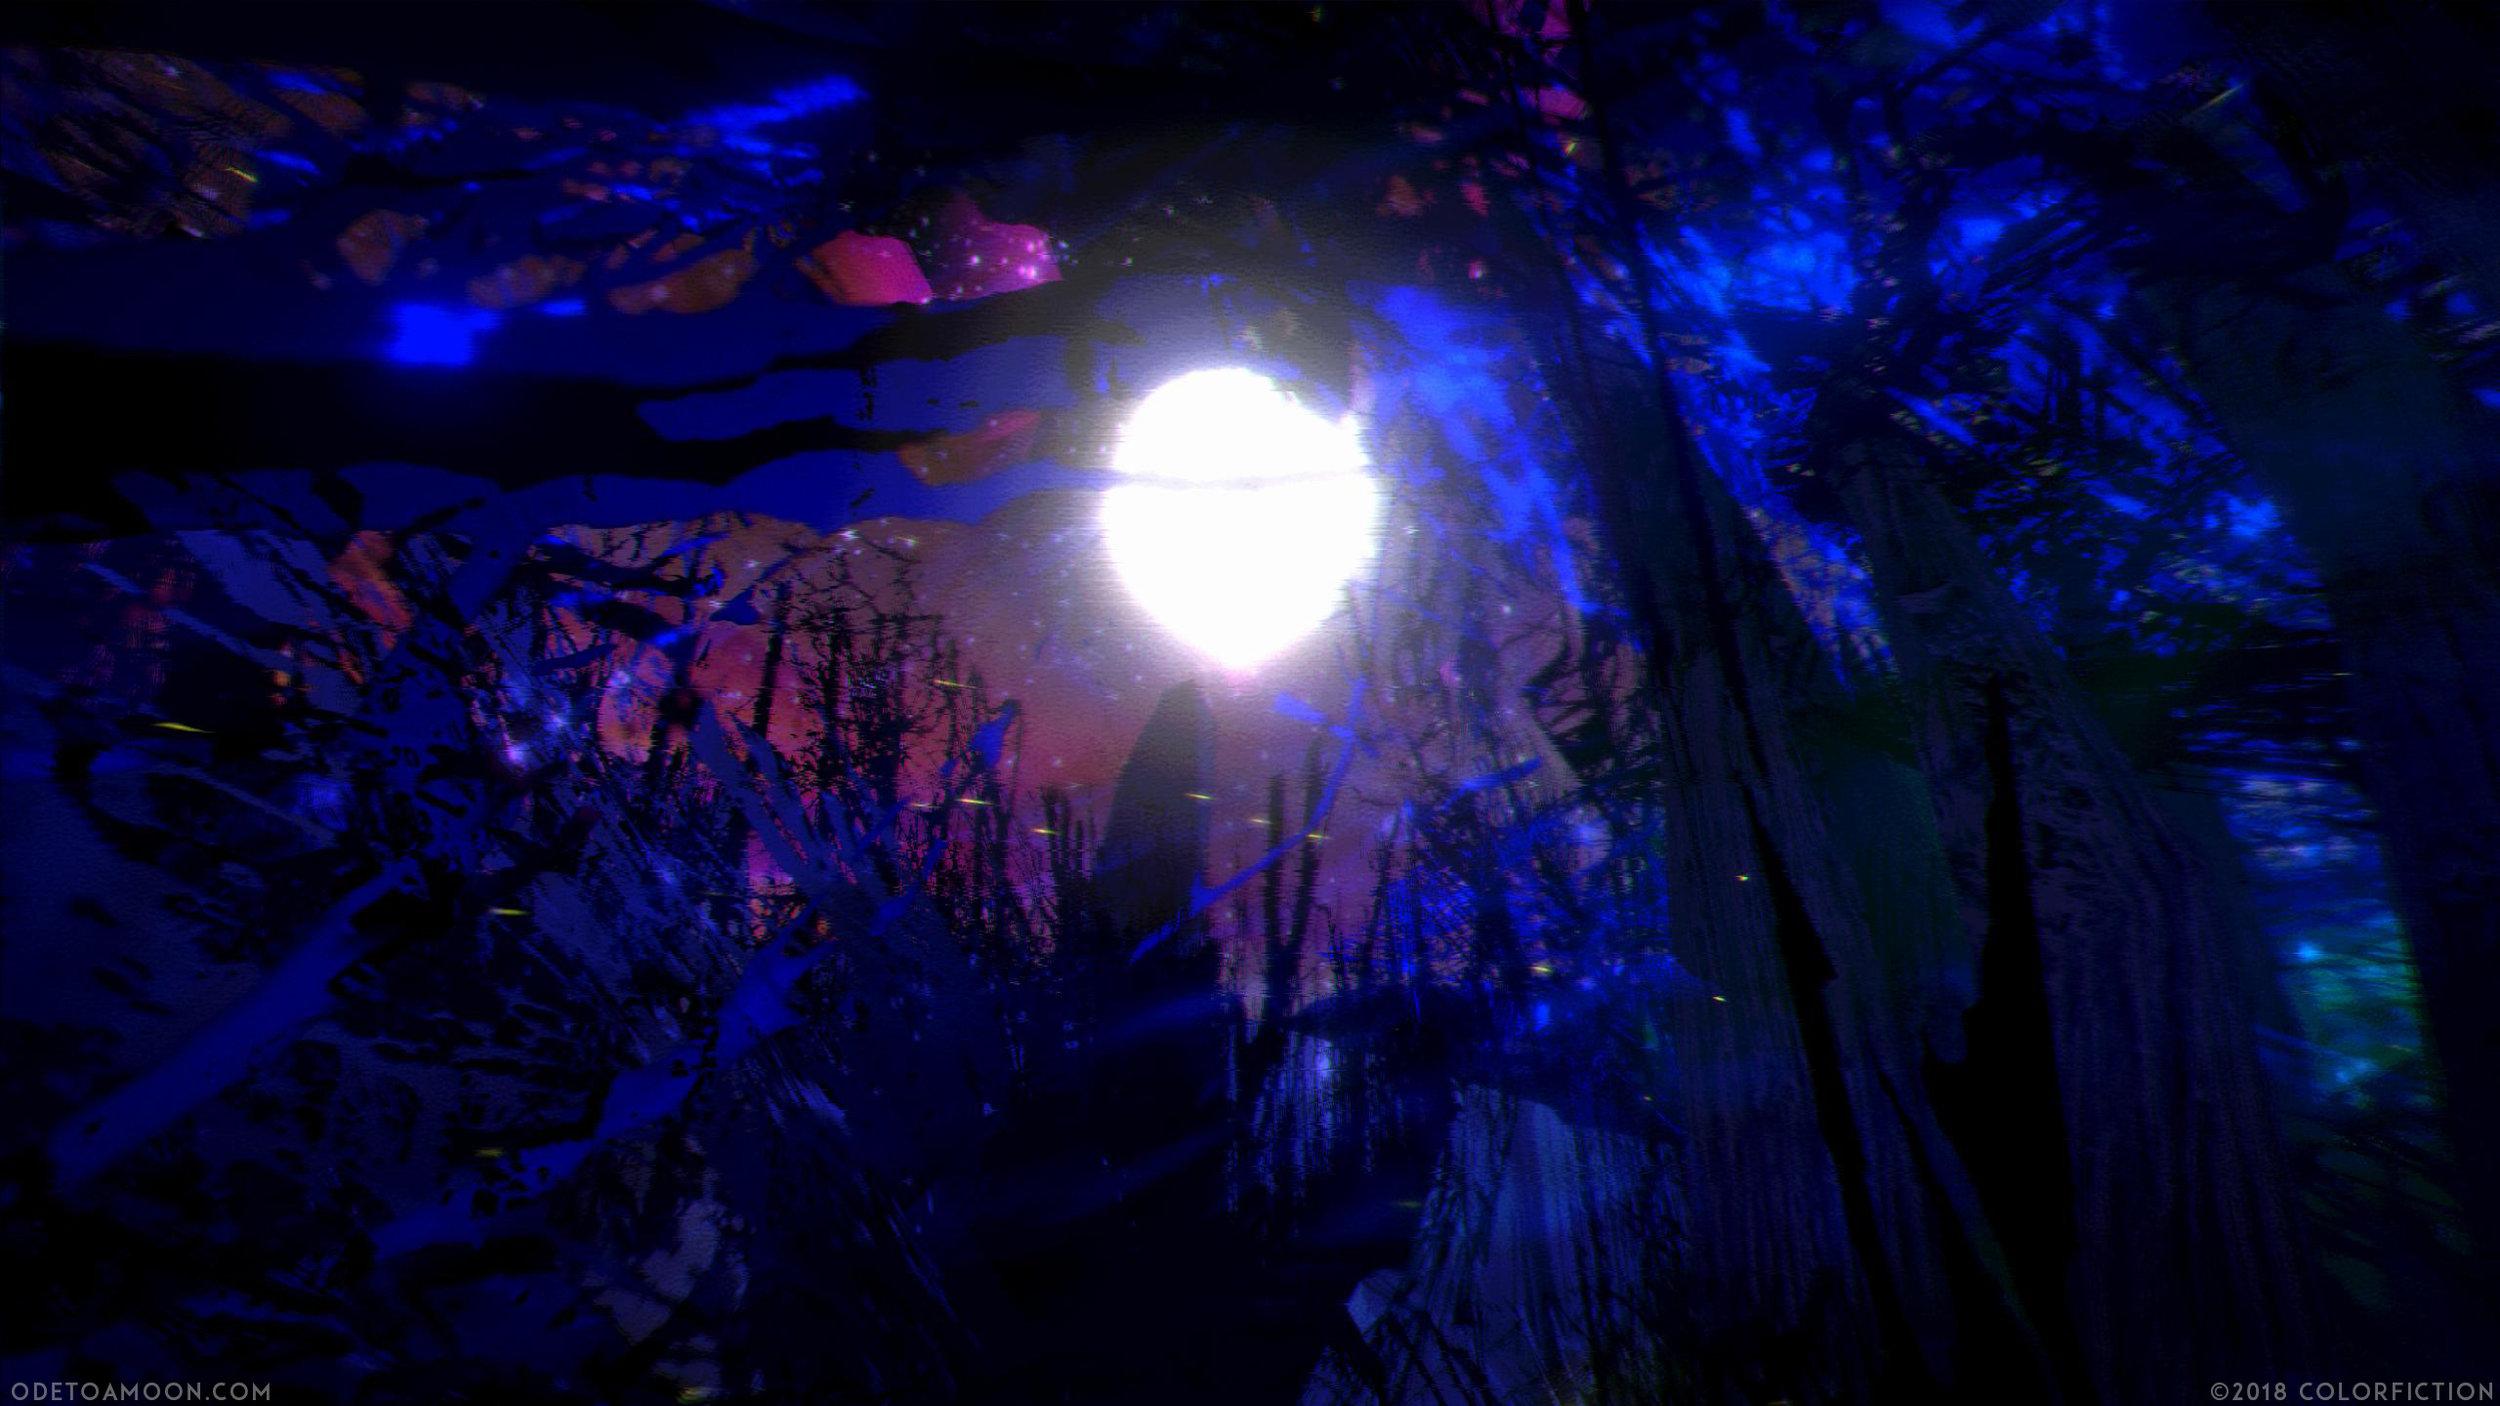 colorfiction_ode_to_a_moon_screenshot_16